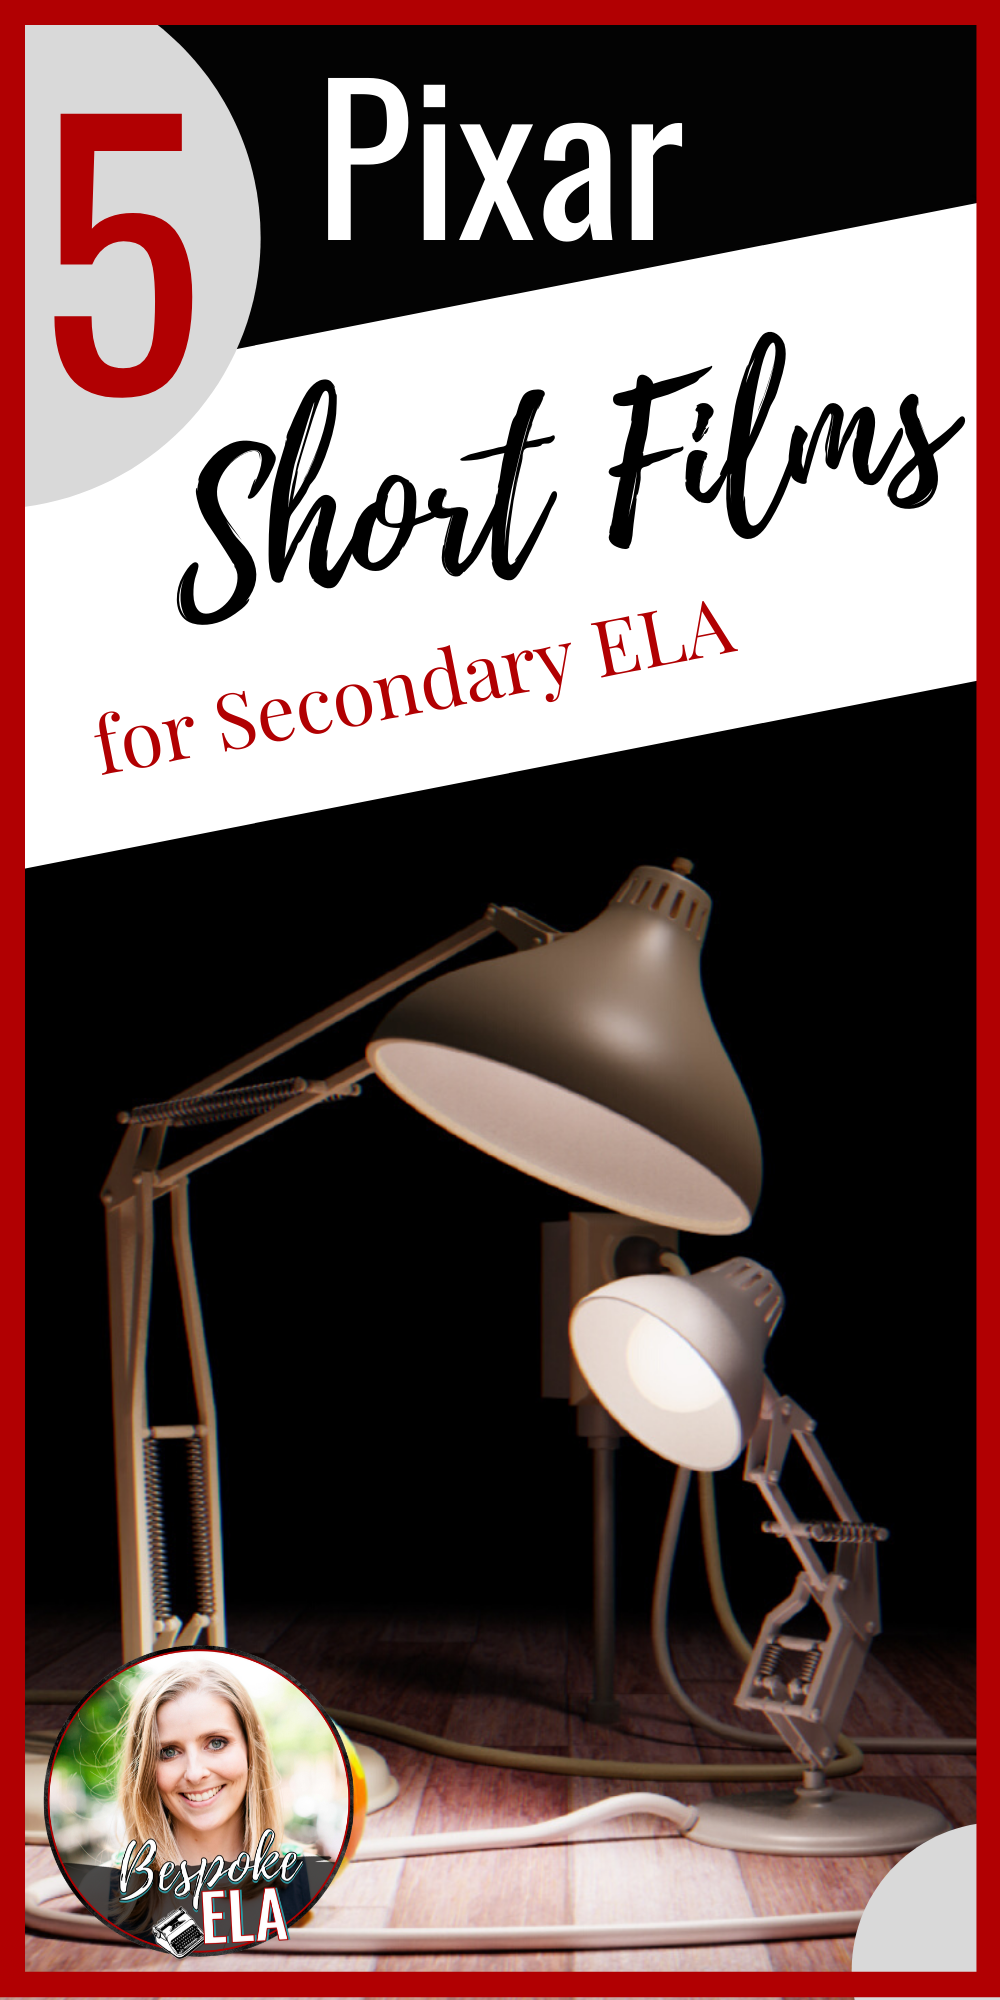 5 Pixar Short Films to Use in Secondary ELA Pixar shorts